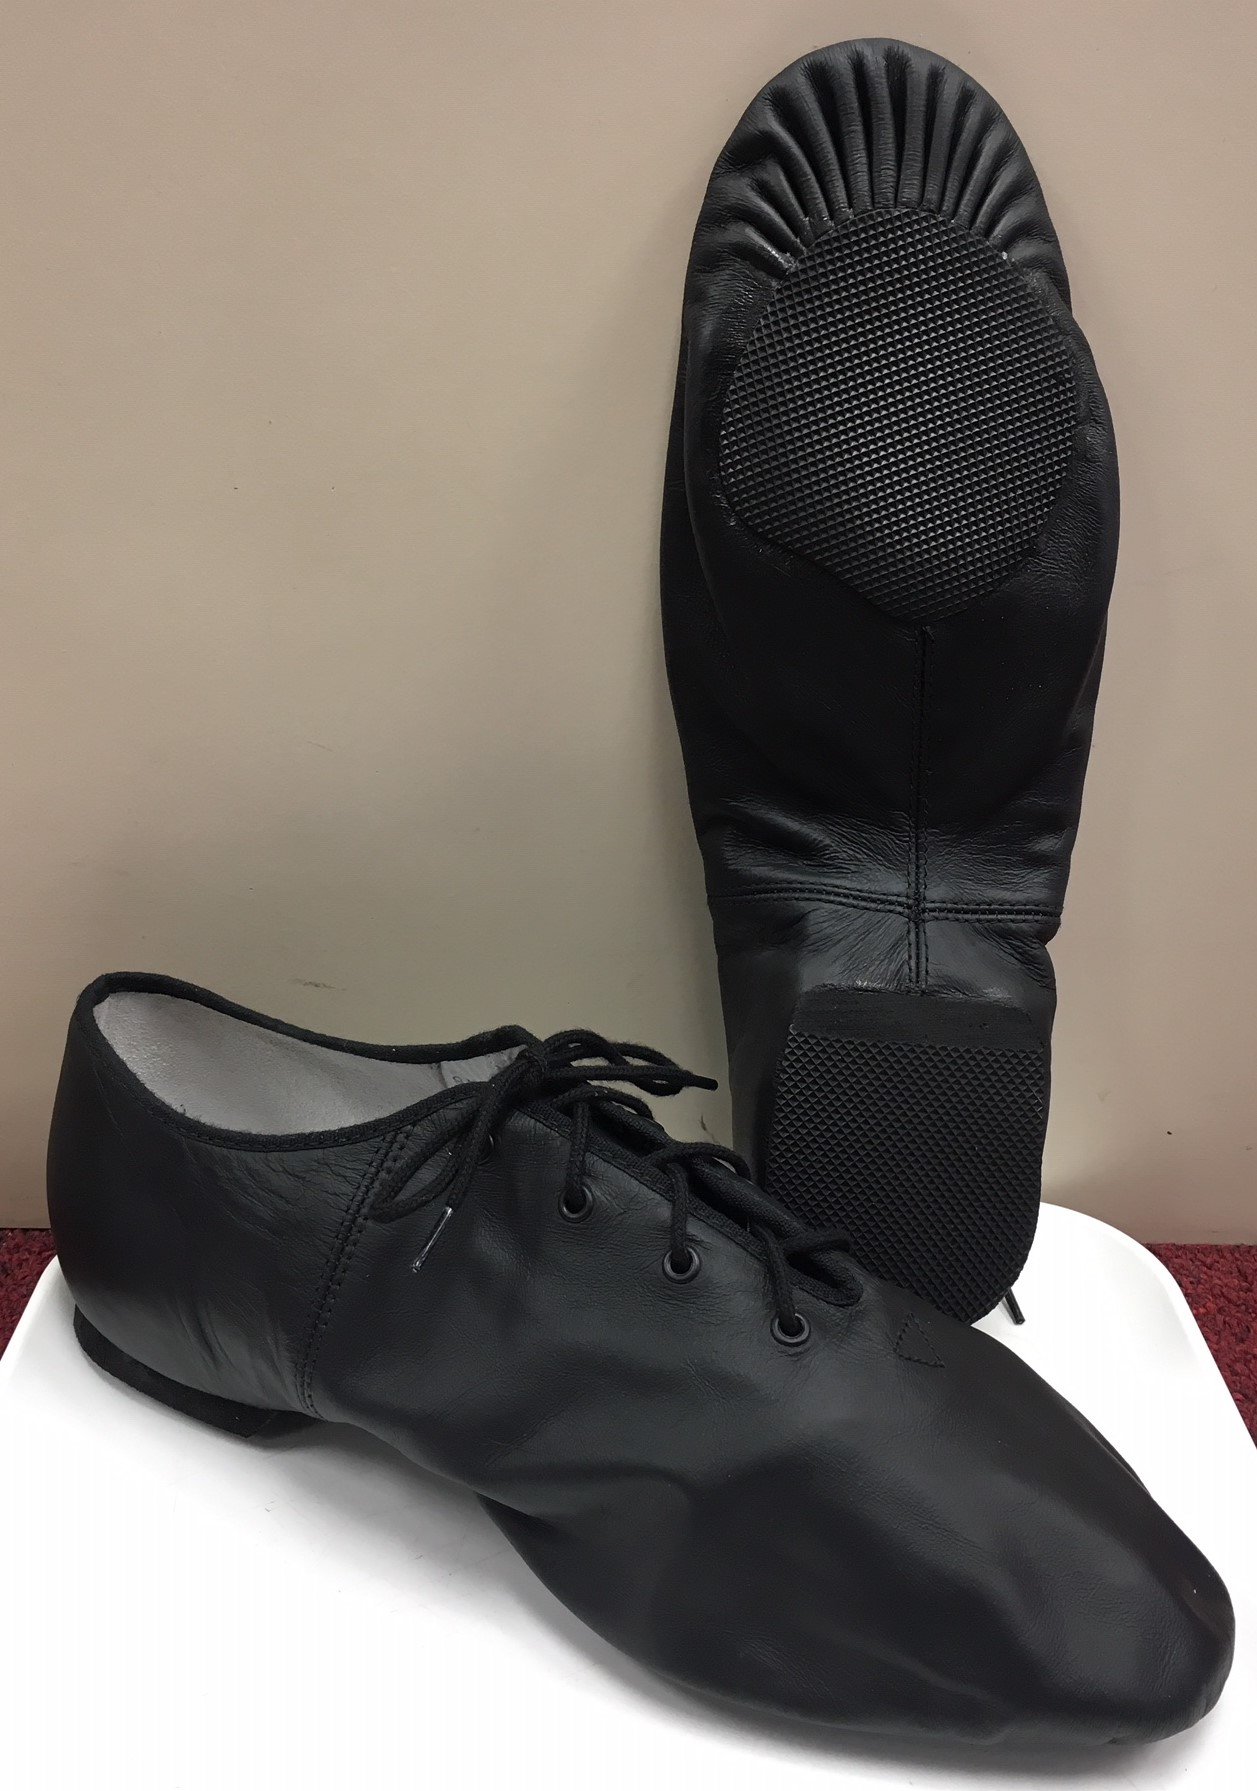 Bloch Ultraflex Men's Jazz Shoes